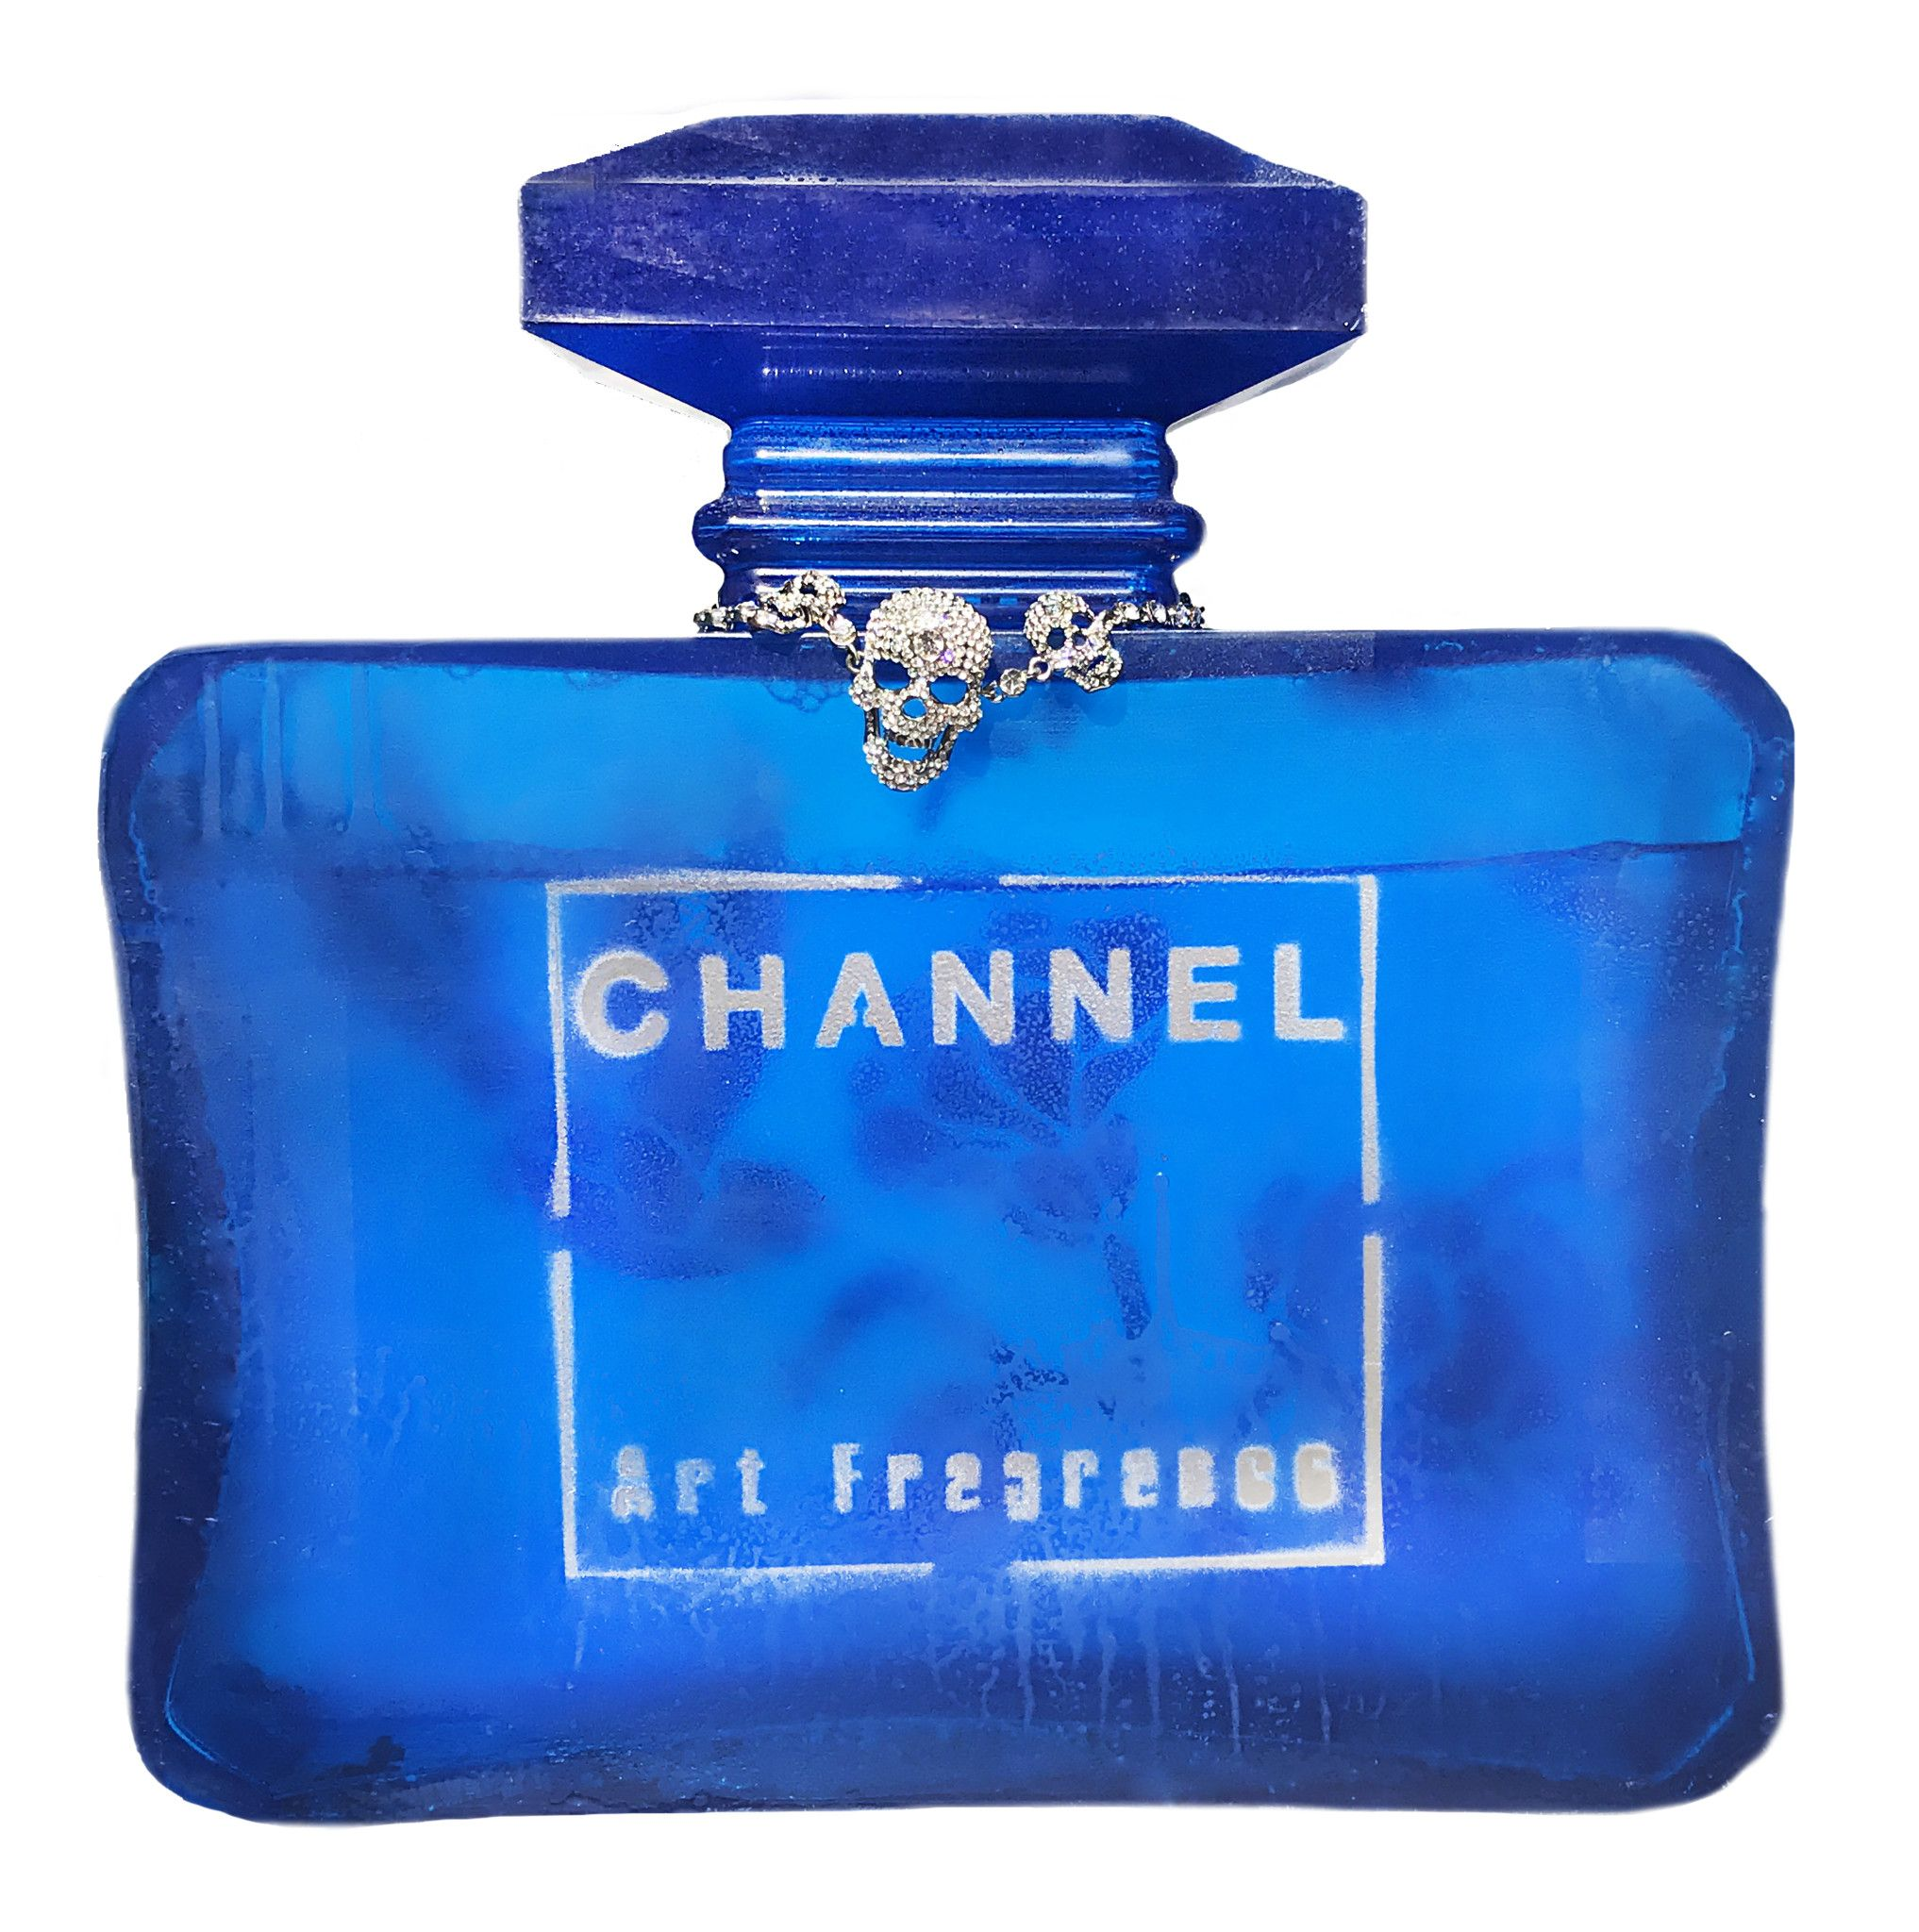 "3D PERFUME  LUDMILLA RADCHENKO  "" CHANNEL ART FRAGRANCE N° 3 ""  dImensioni  L 30 x H 30 x P 7  cm."